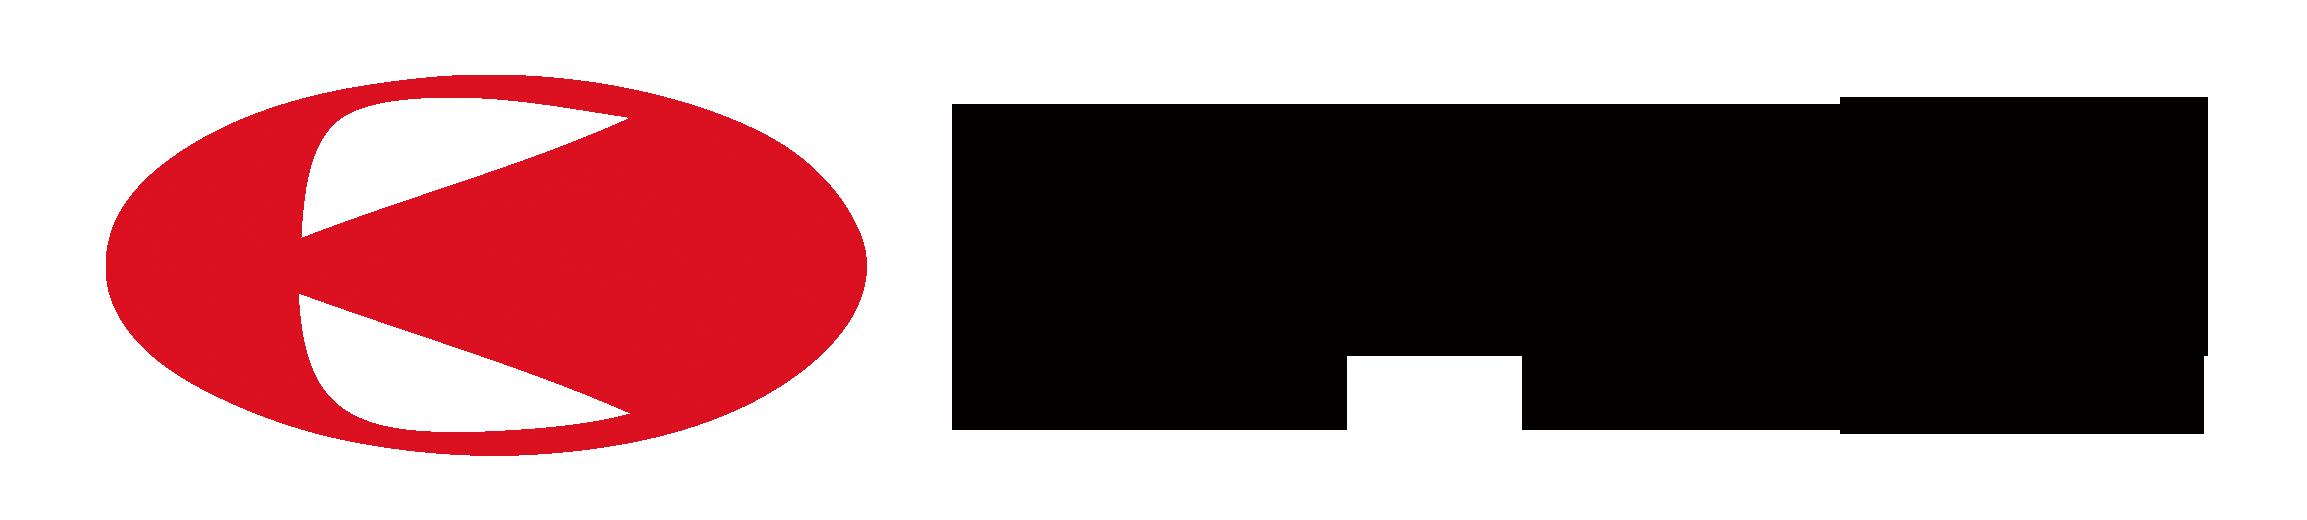 Dandong Dongfang Measurement & Control Technology Co., Ltd.